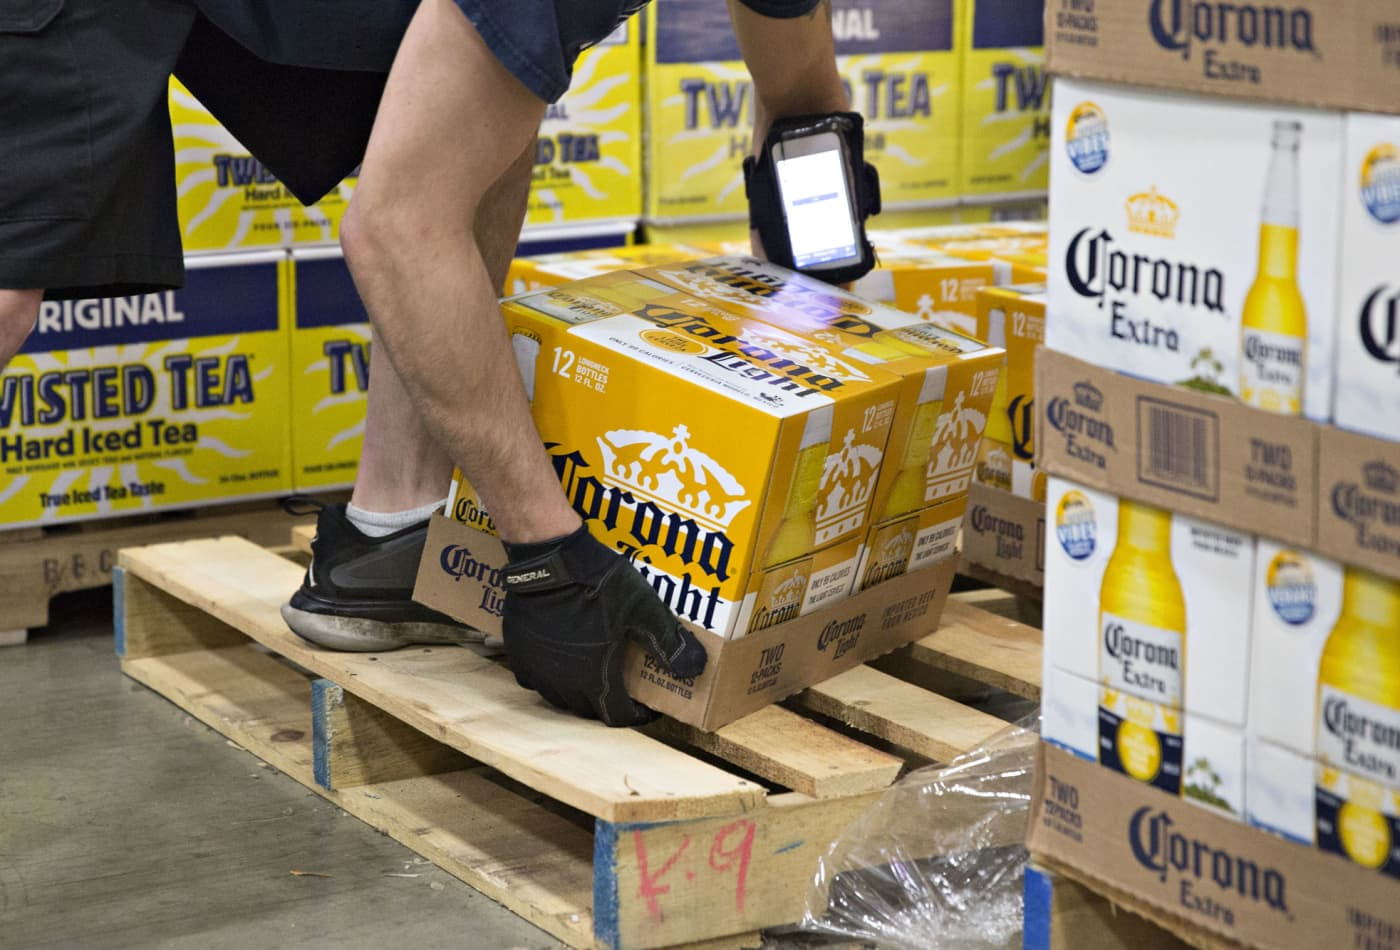 Corona will continue pushing controversial new hard seltzer ad amid coronavirus outbreak